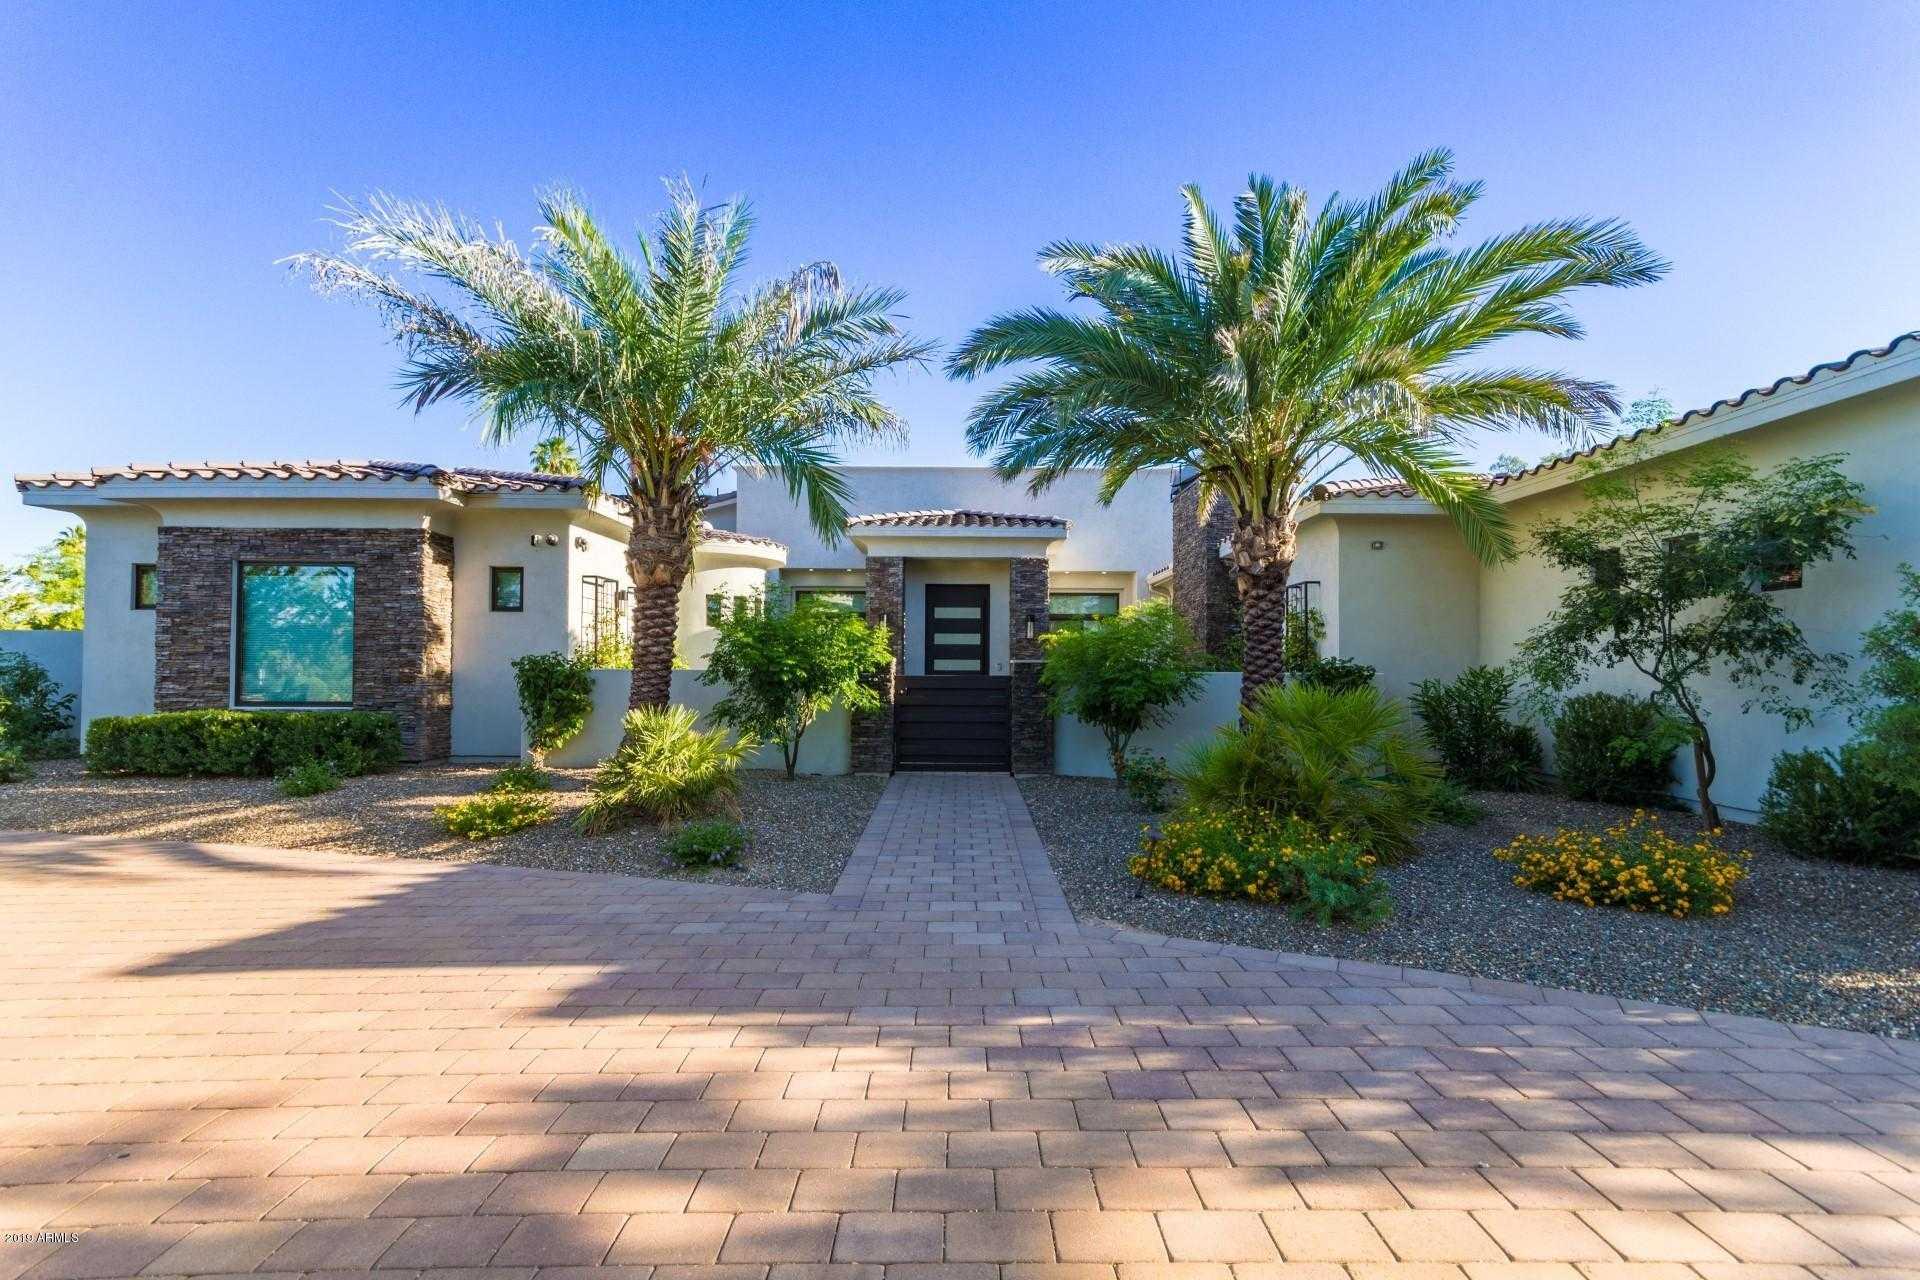 $3,595,000 - 5Br/6Ba - Home for Sale in Mockingbird Lane Estates 6, Paradise Valley